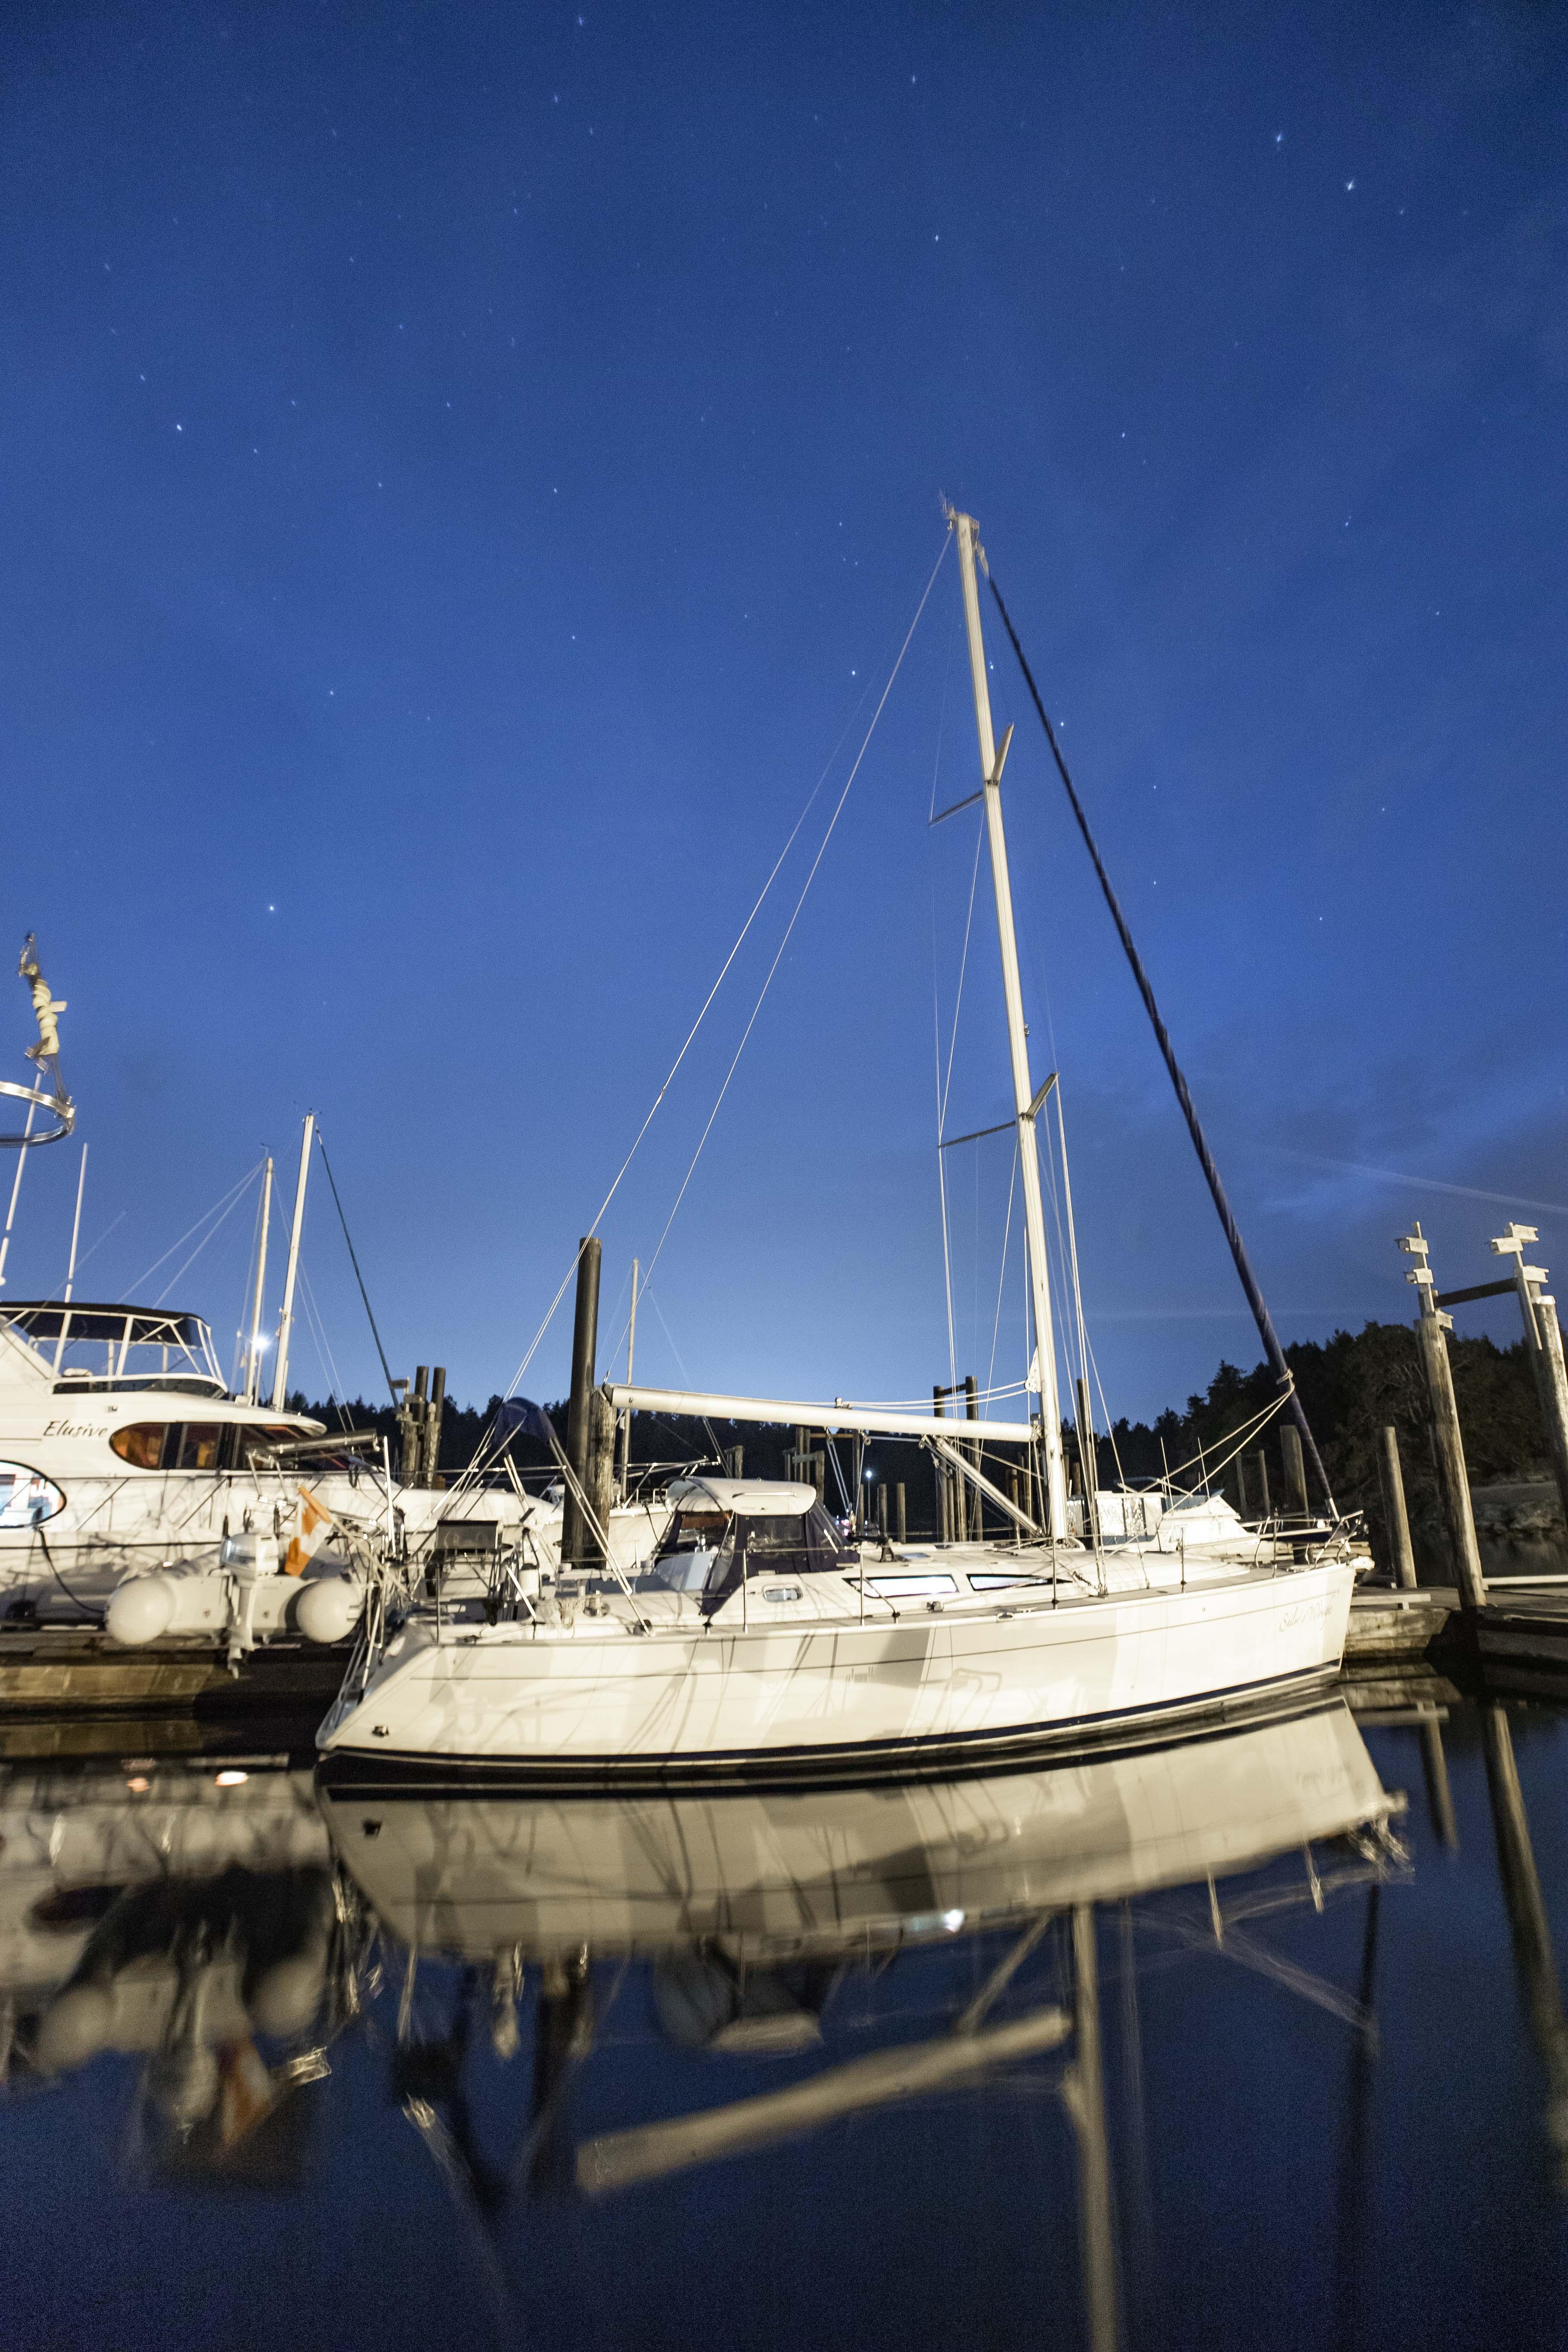 Midnight at Newcastle Island docks